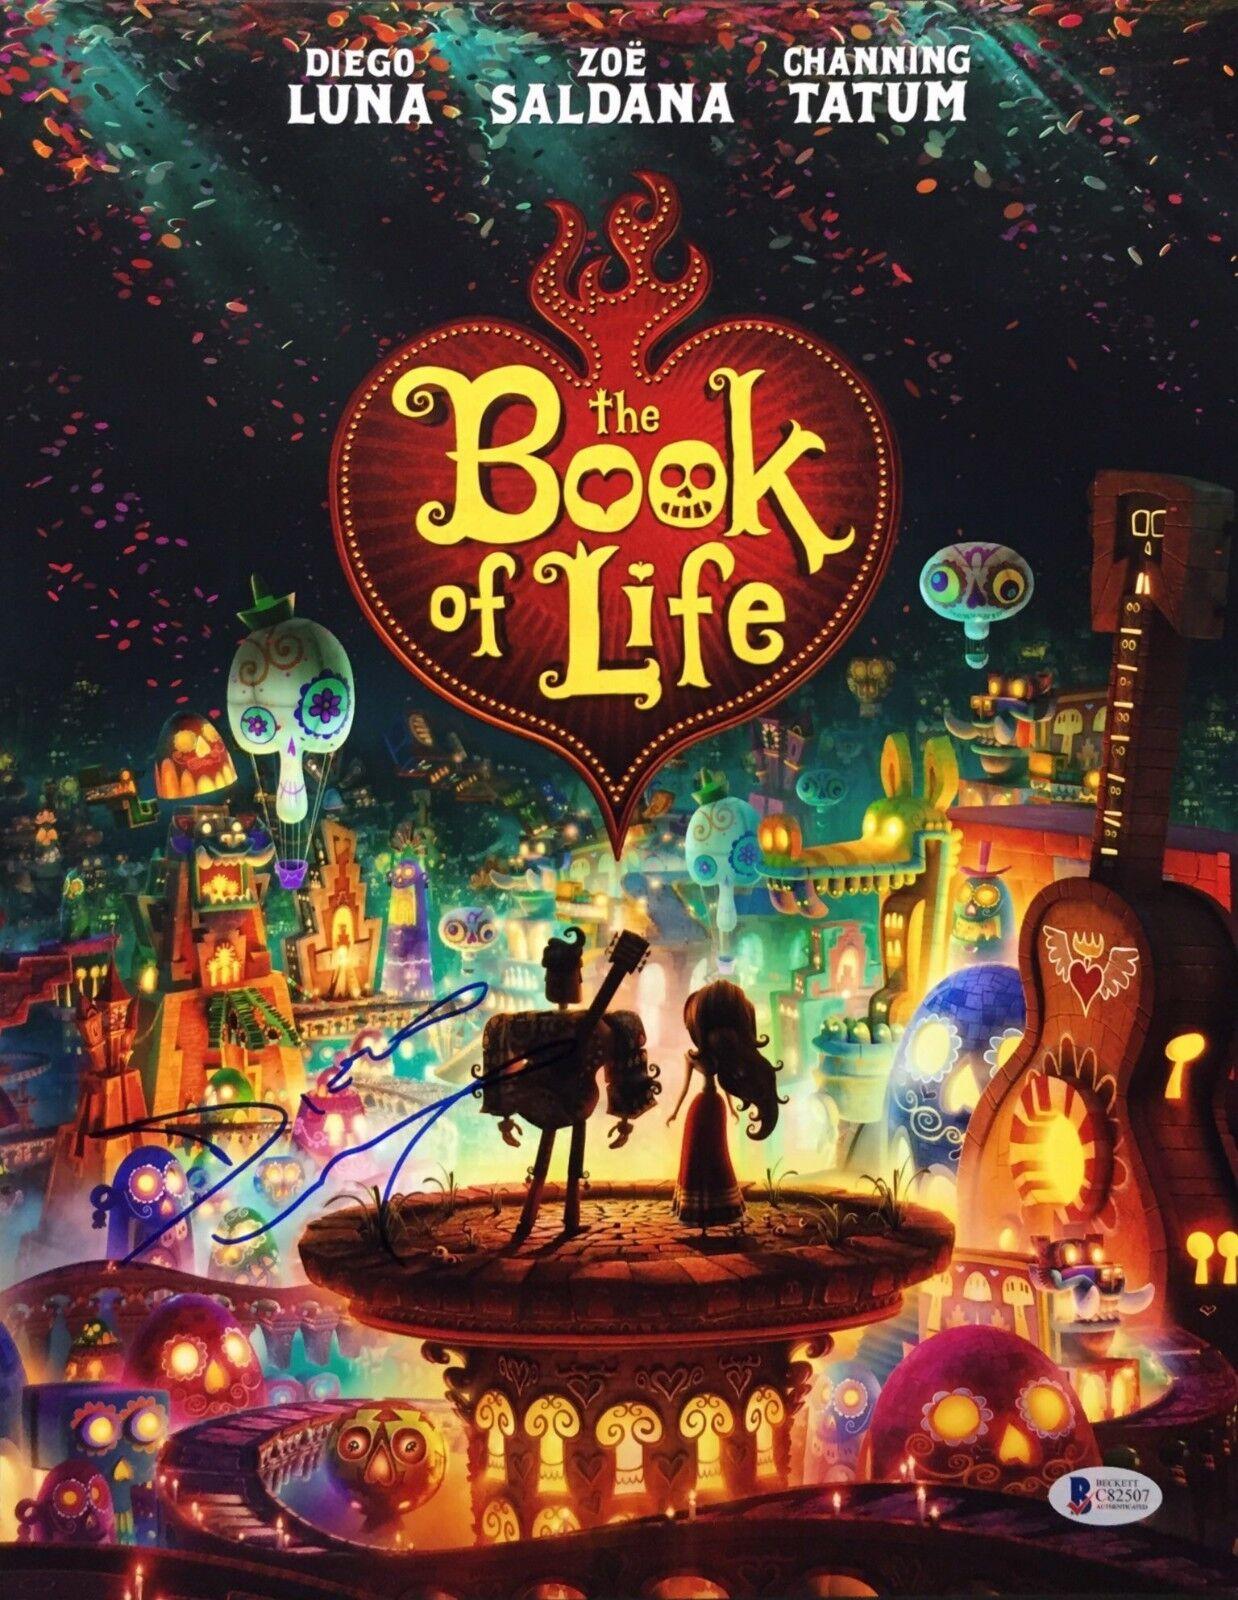 Diego Luna Signed Book Of Life 11x14 Photo Beckett C82507